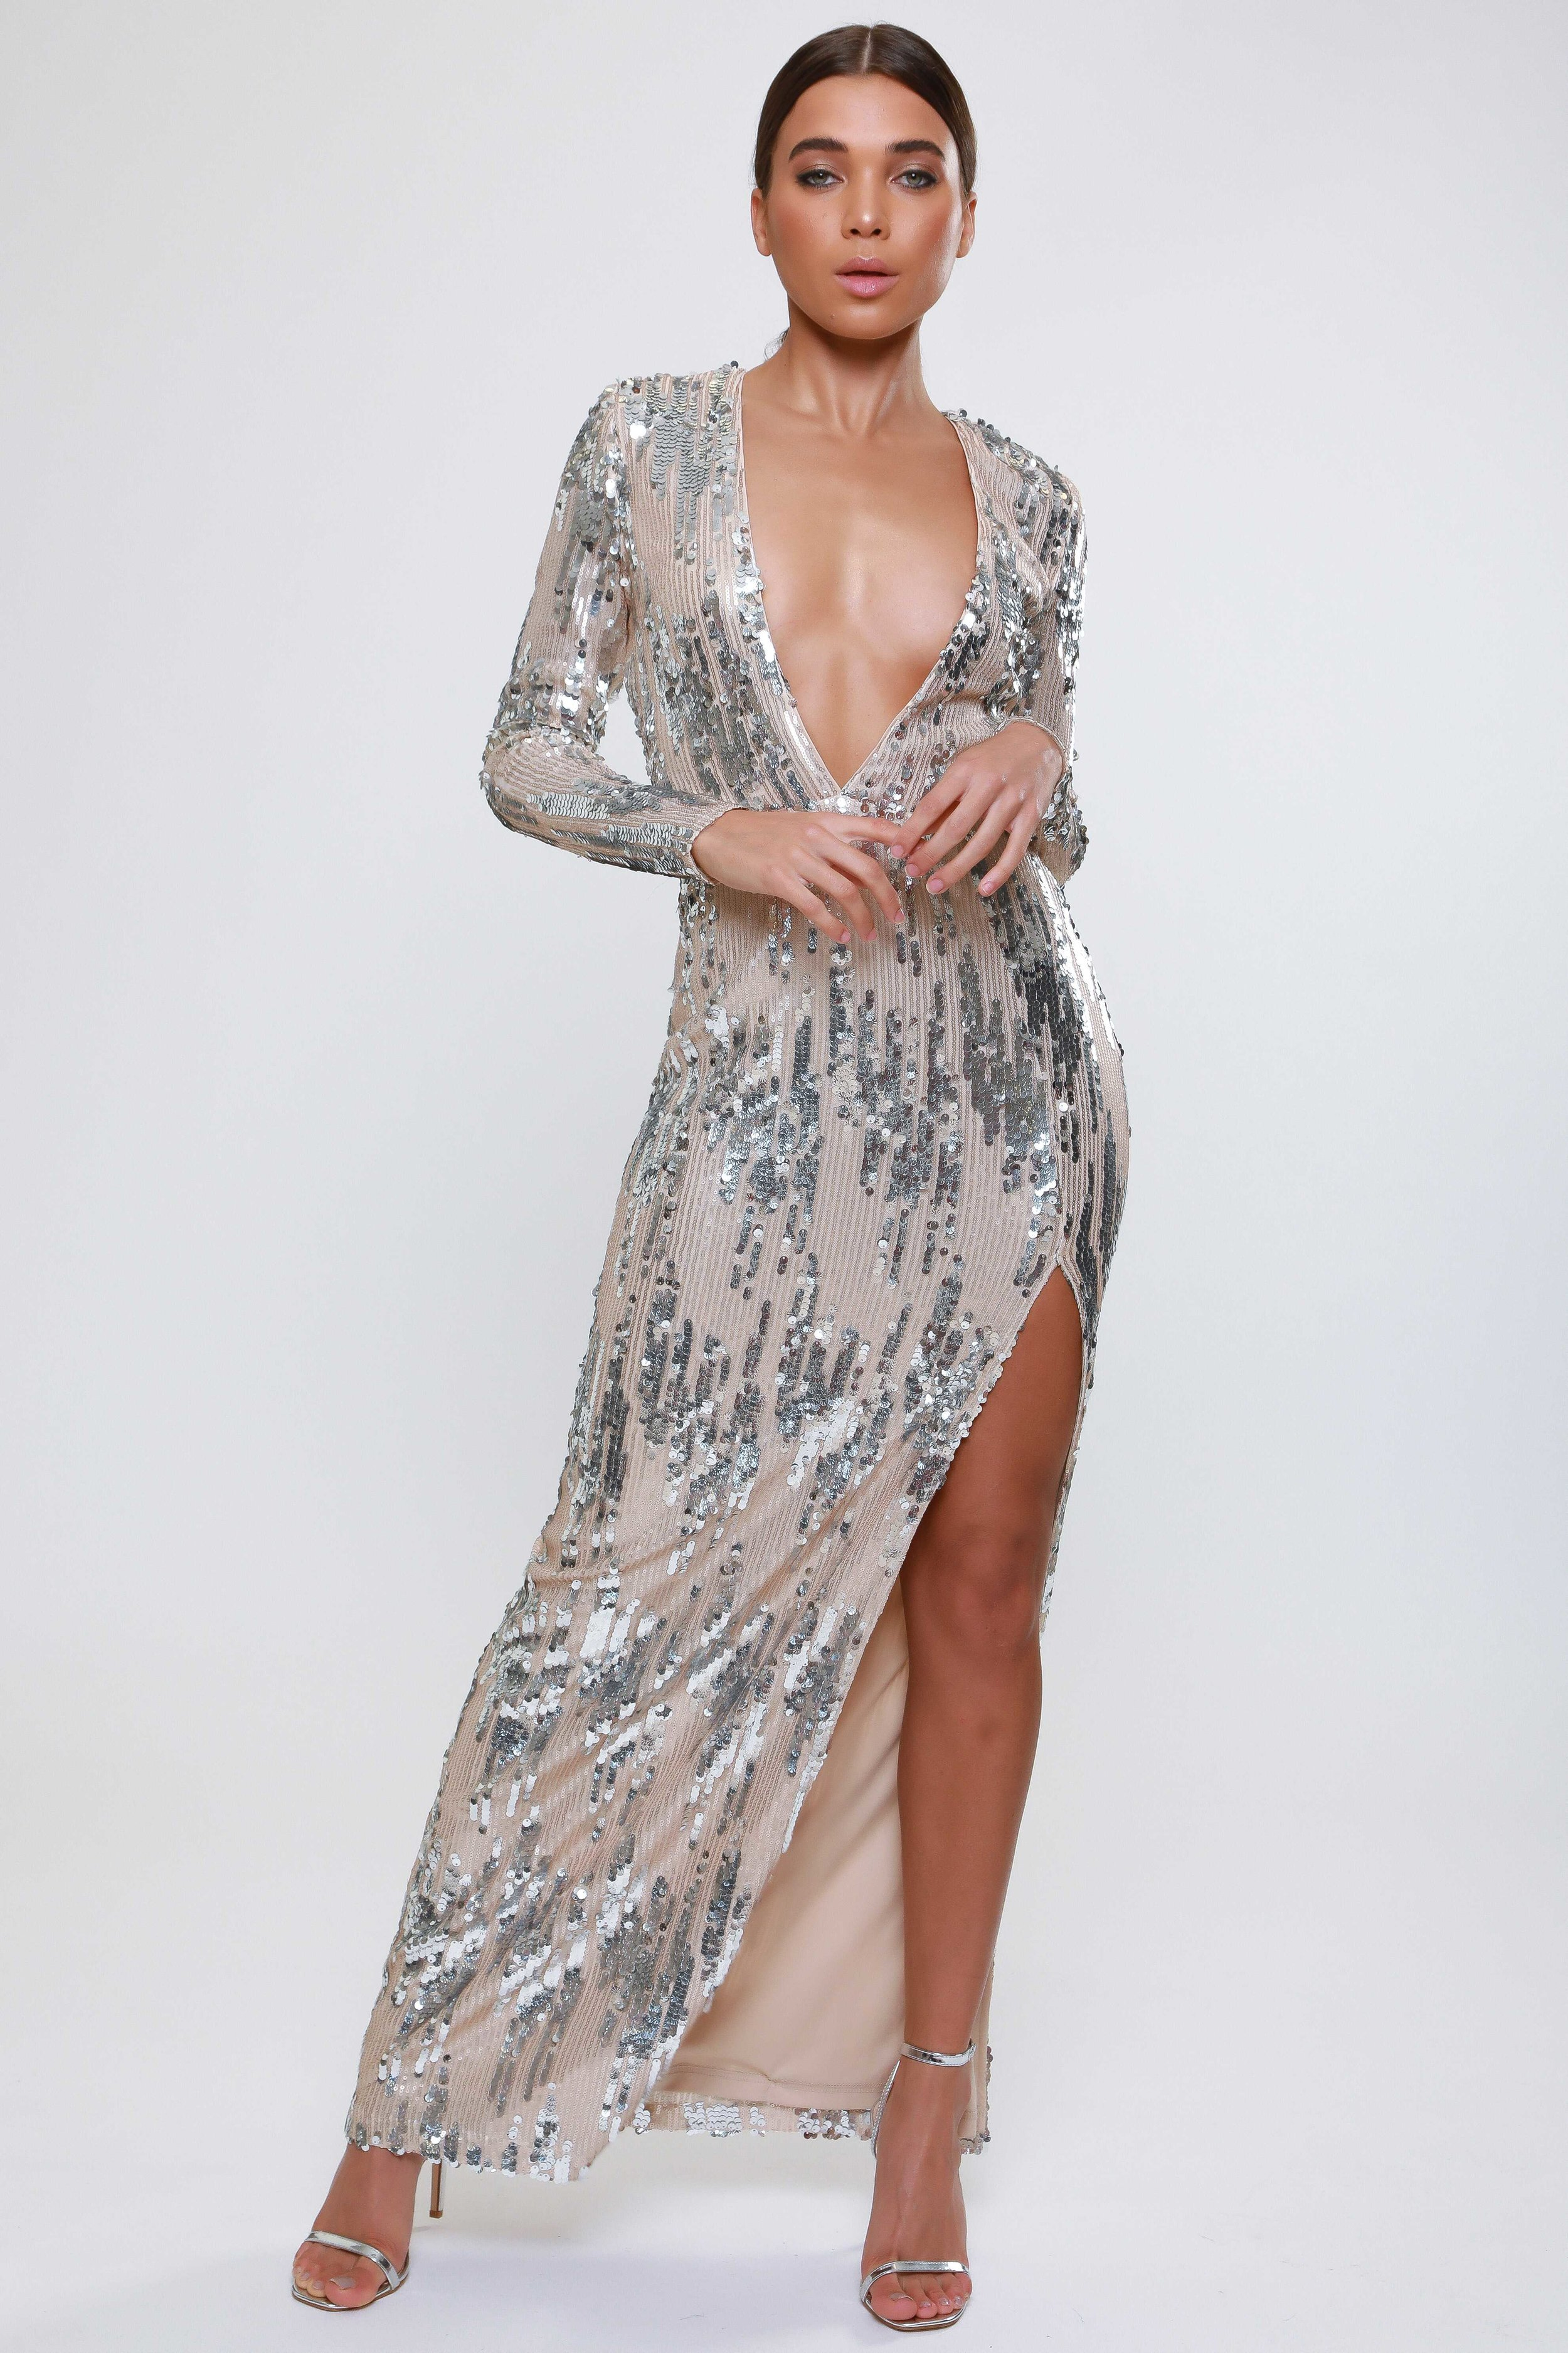 Sequin Plunge  Maxi Dress   £125.00